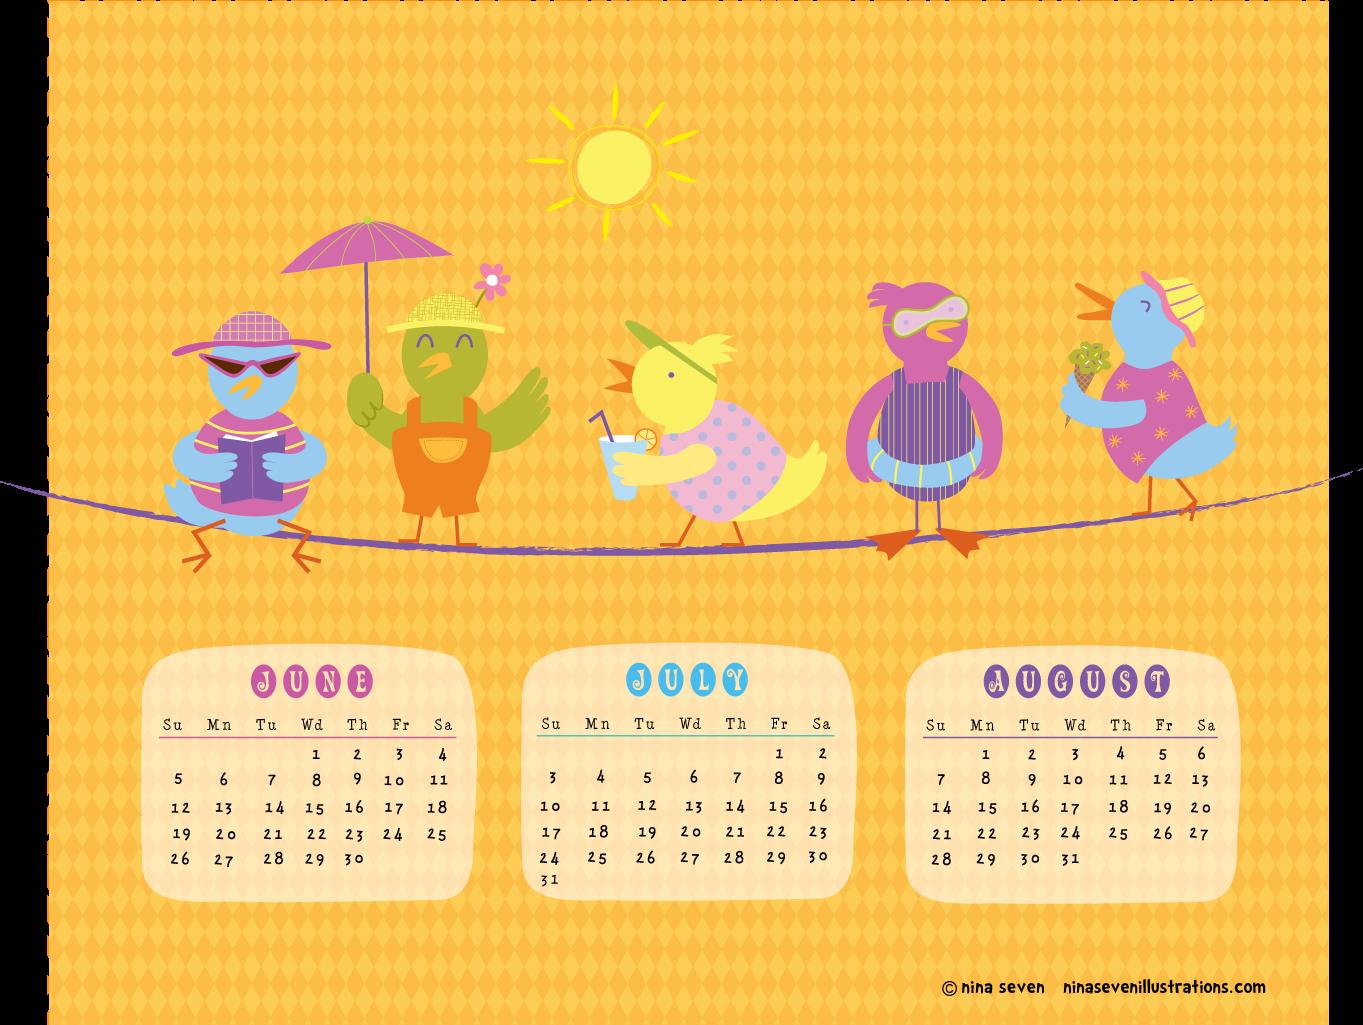 http://2.bp.blogspot.com/-xWVaHwB1N4Q/TeZPRM4wTFI/AAAAAAAAAVw/CnNuWNAFtMA/s1600/1280x1024_summer_+calendar.png